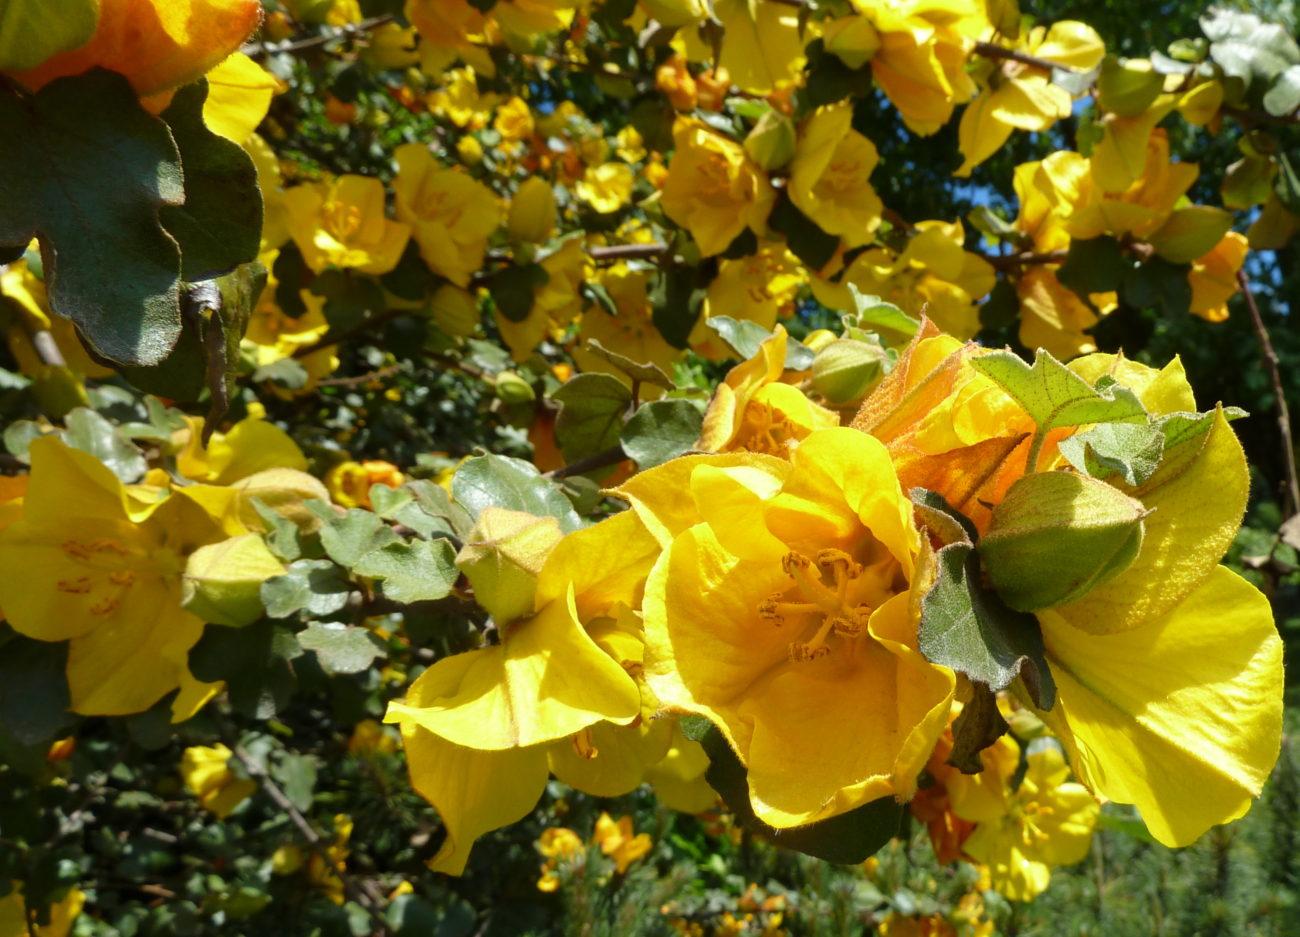 Astounding Fremontodendron Californicum Photo By Flickr User Wendy Cutler 1300x937 San Gabriel Nursery S San Gabriel Nursery Robbery houzz 01 San Gabriel Nursery